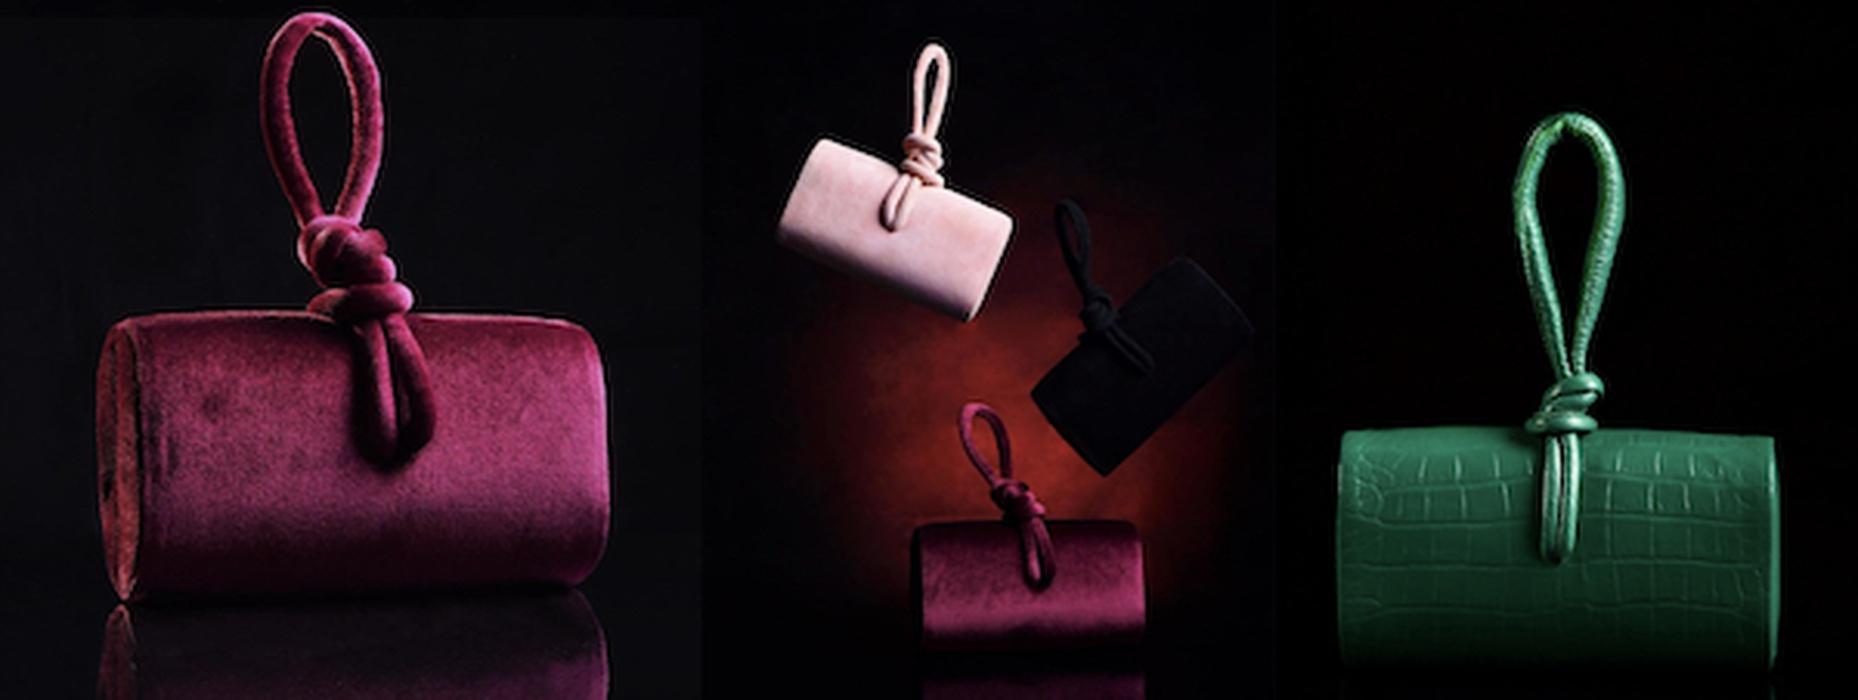 Ahikoza Melansir Koleksi Tas Kecil yang Sustainable & Elegan